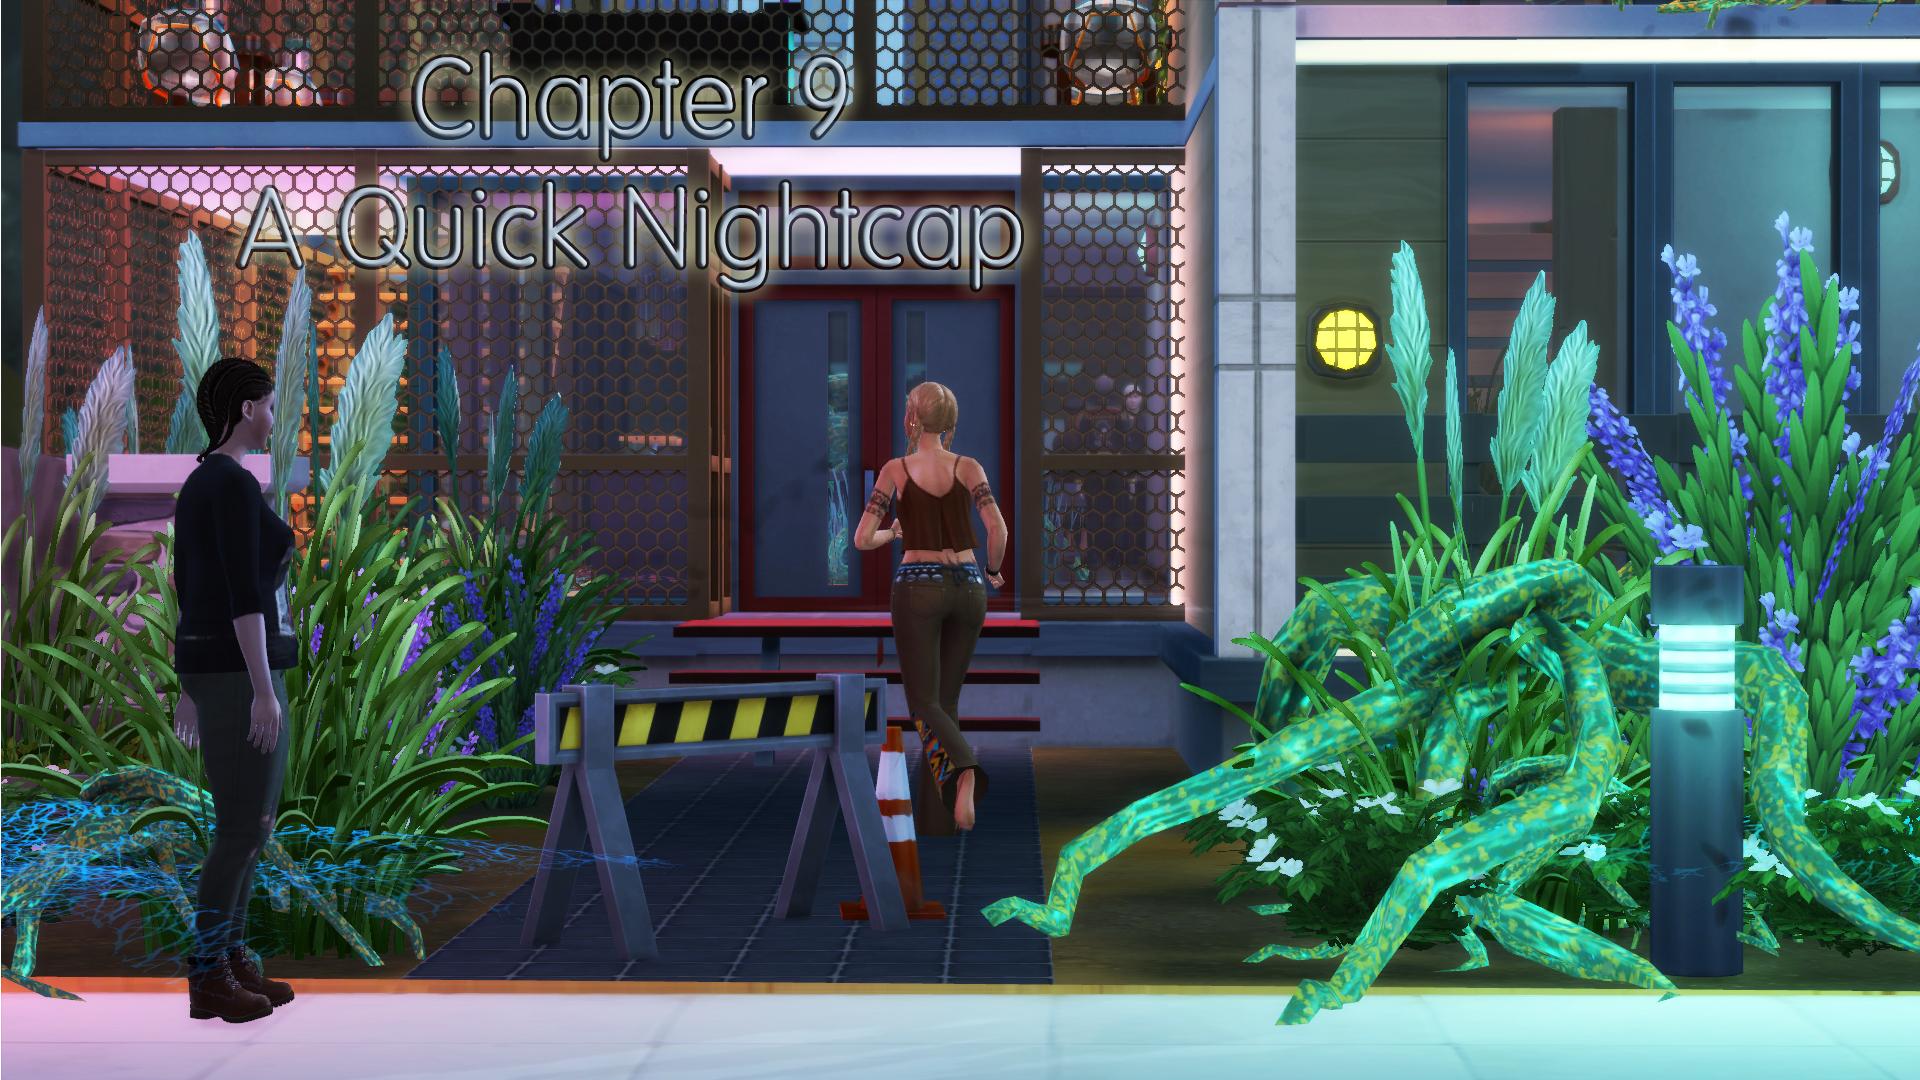 1 A quick nightcap title